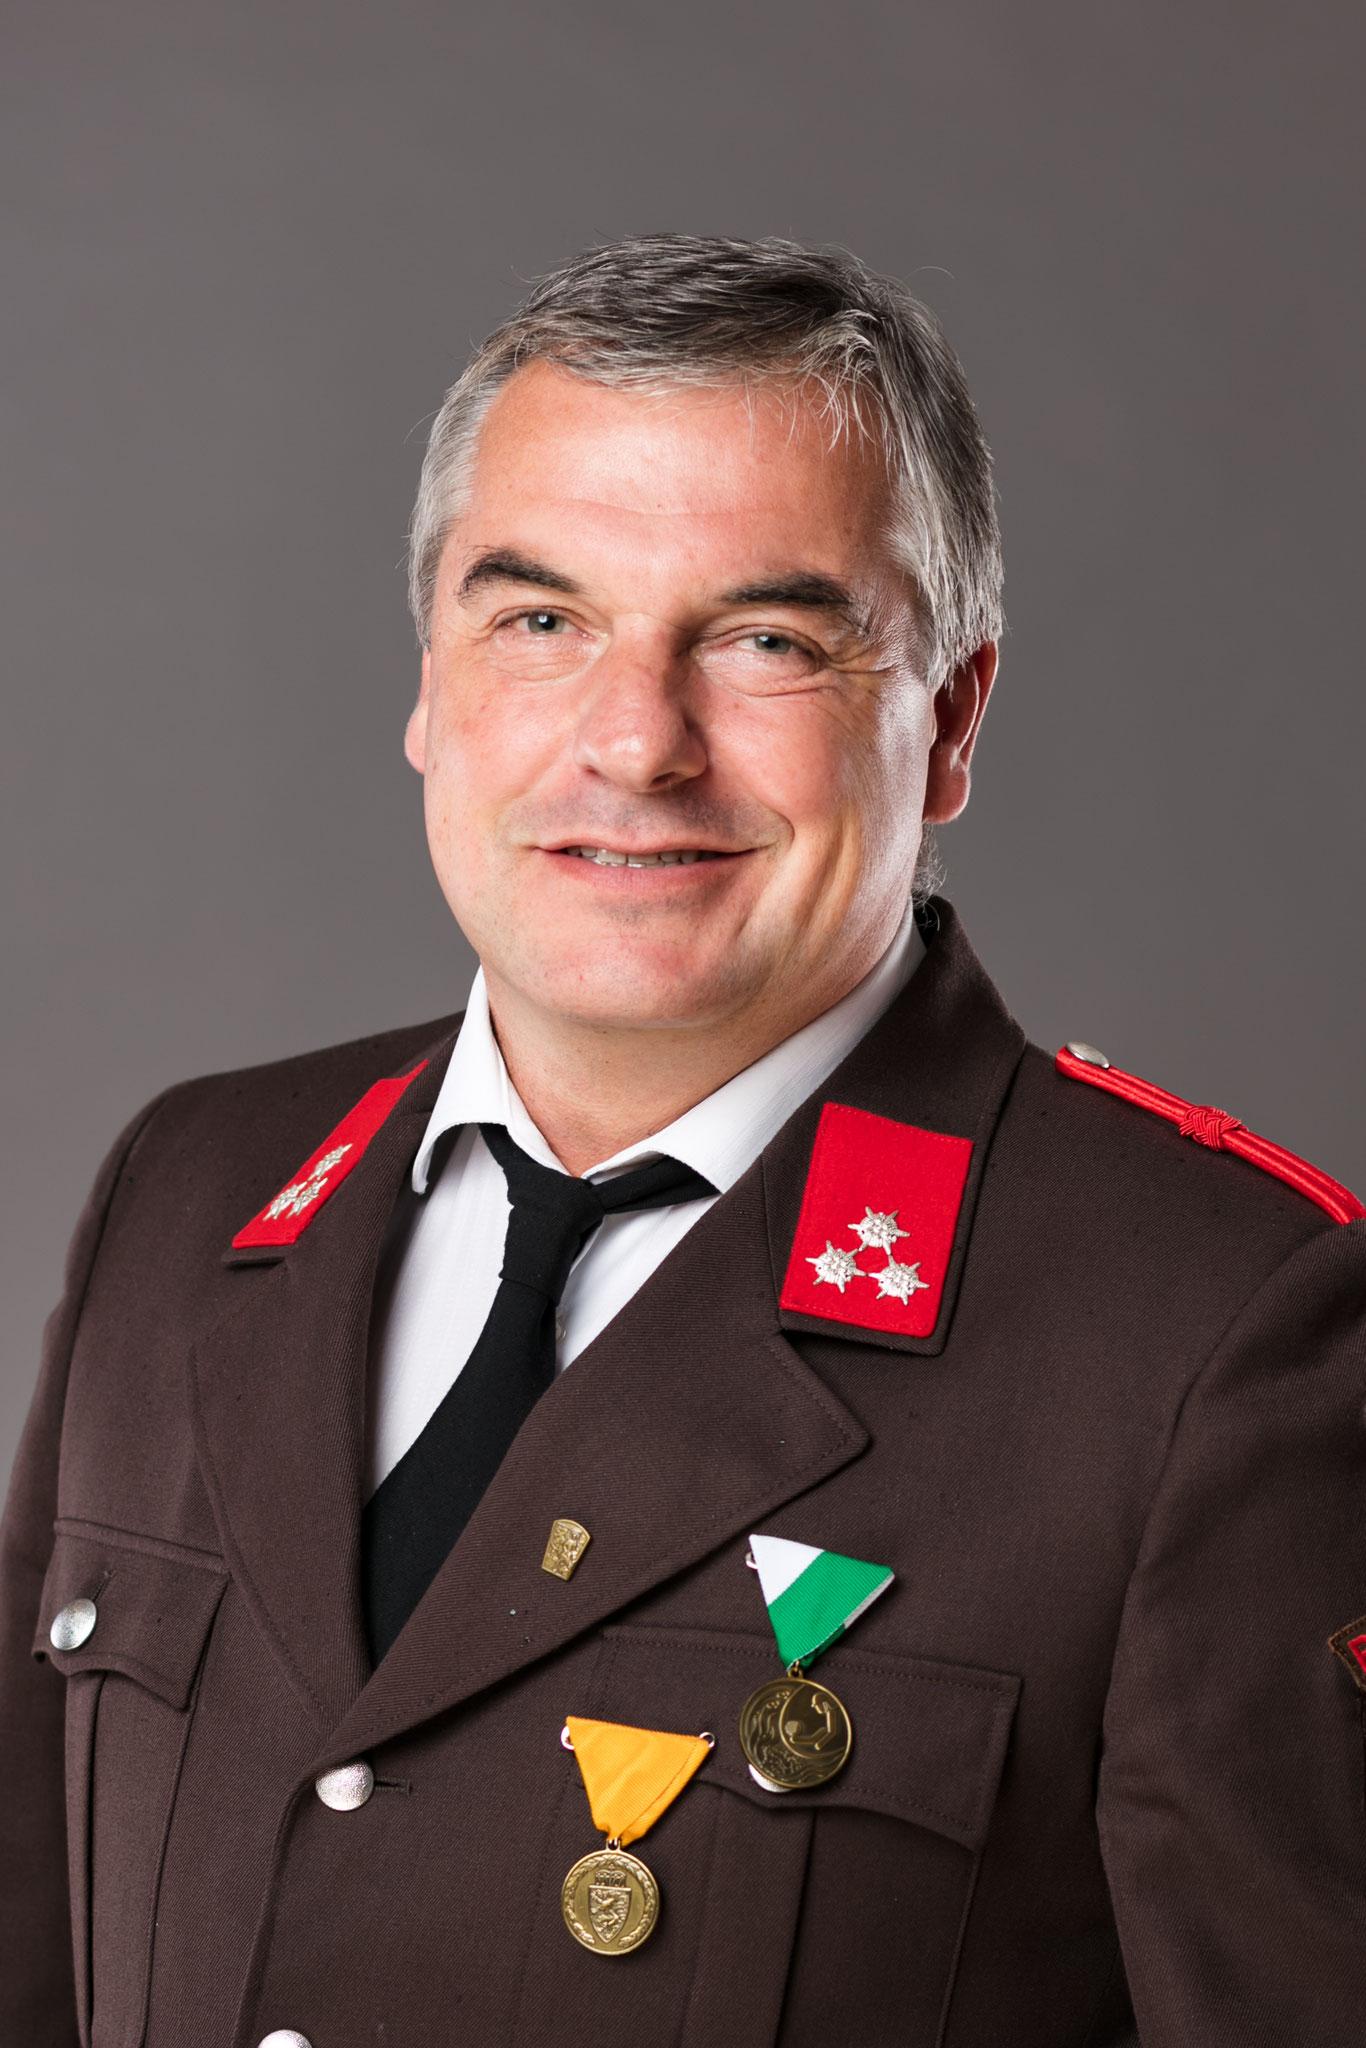 HFM BOHNSTINGL Karl